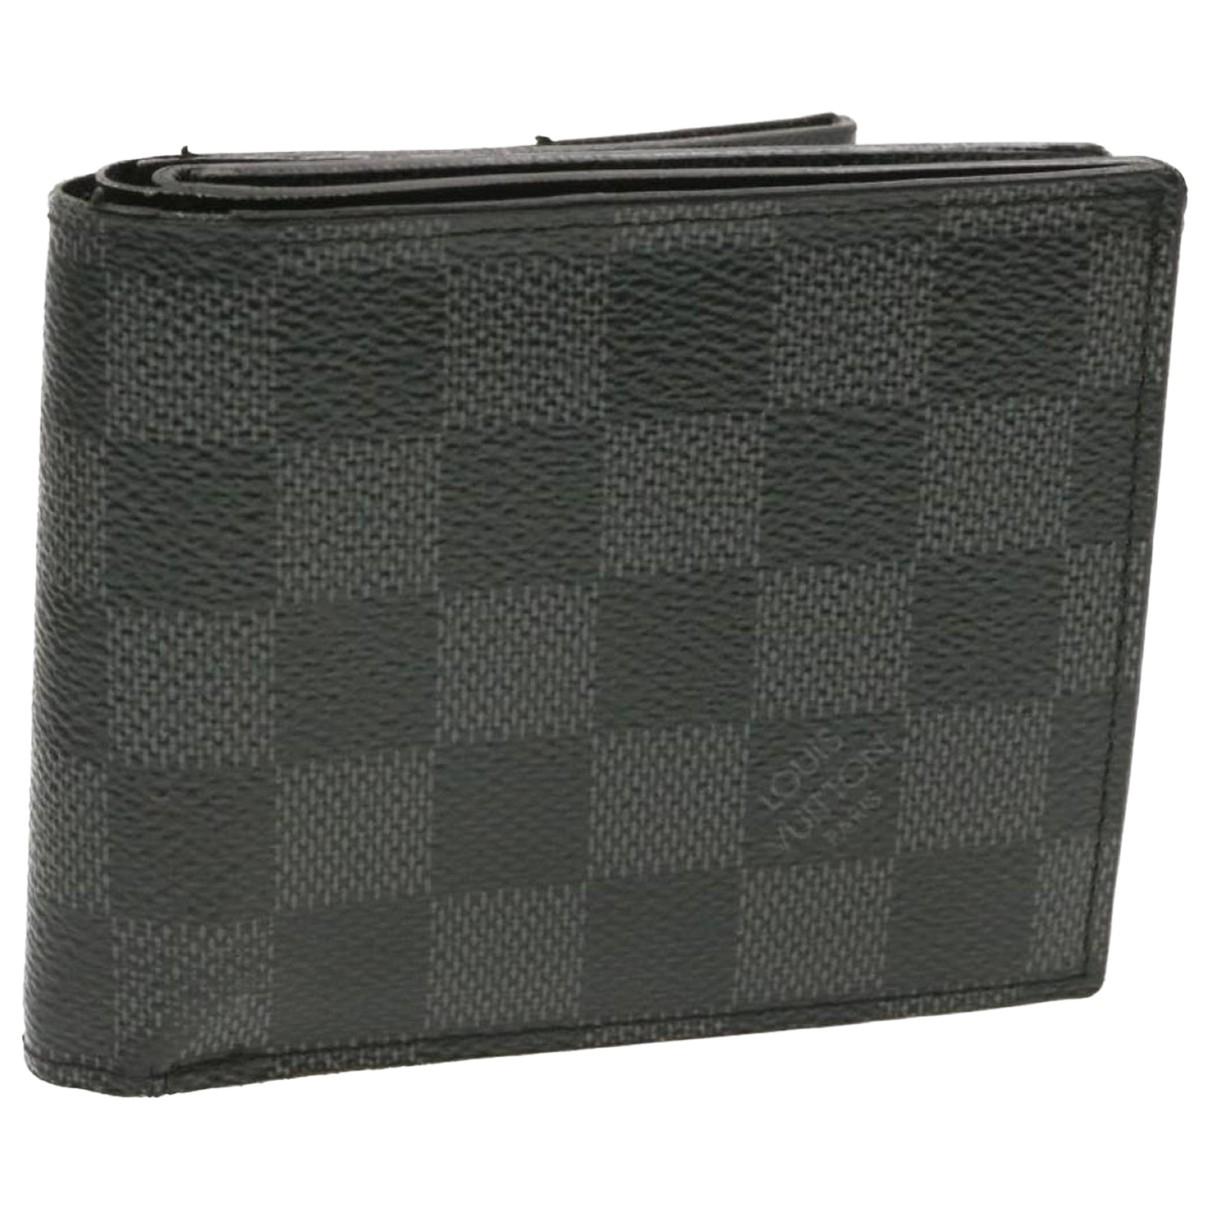 Louis Vuitton N Black scarf for Women N